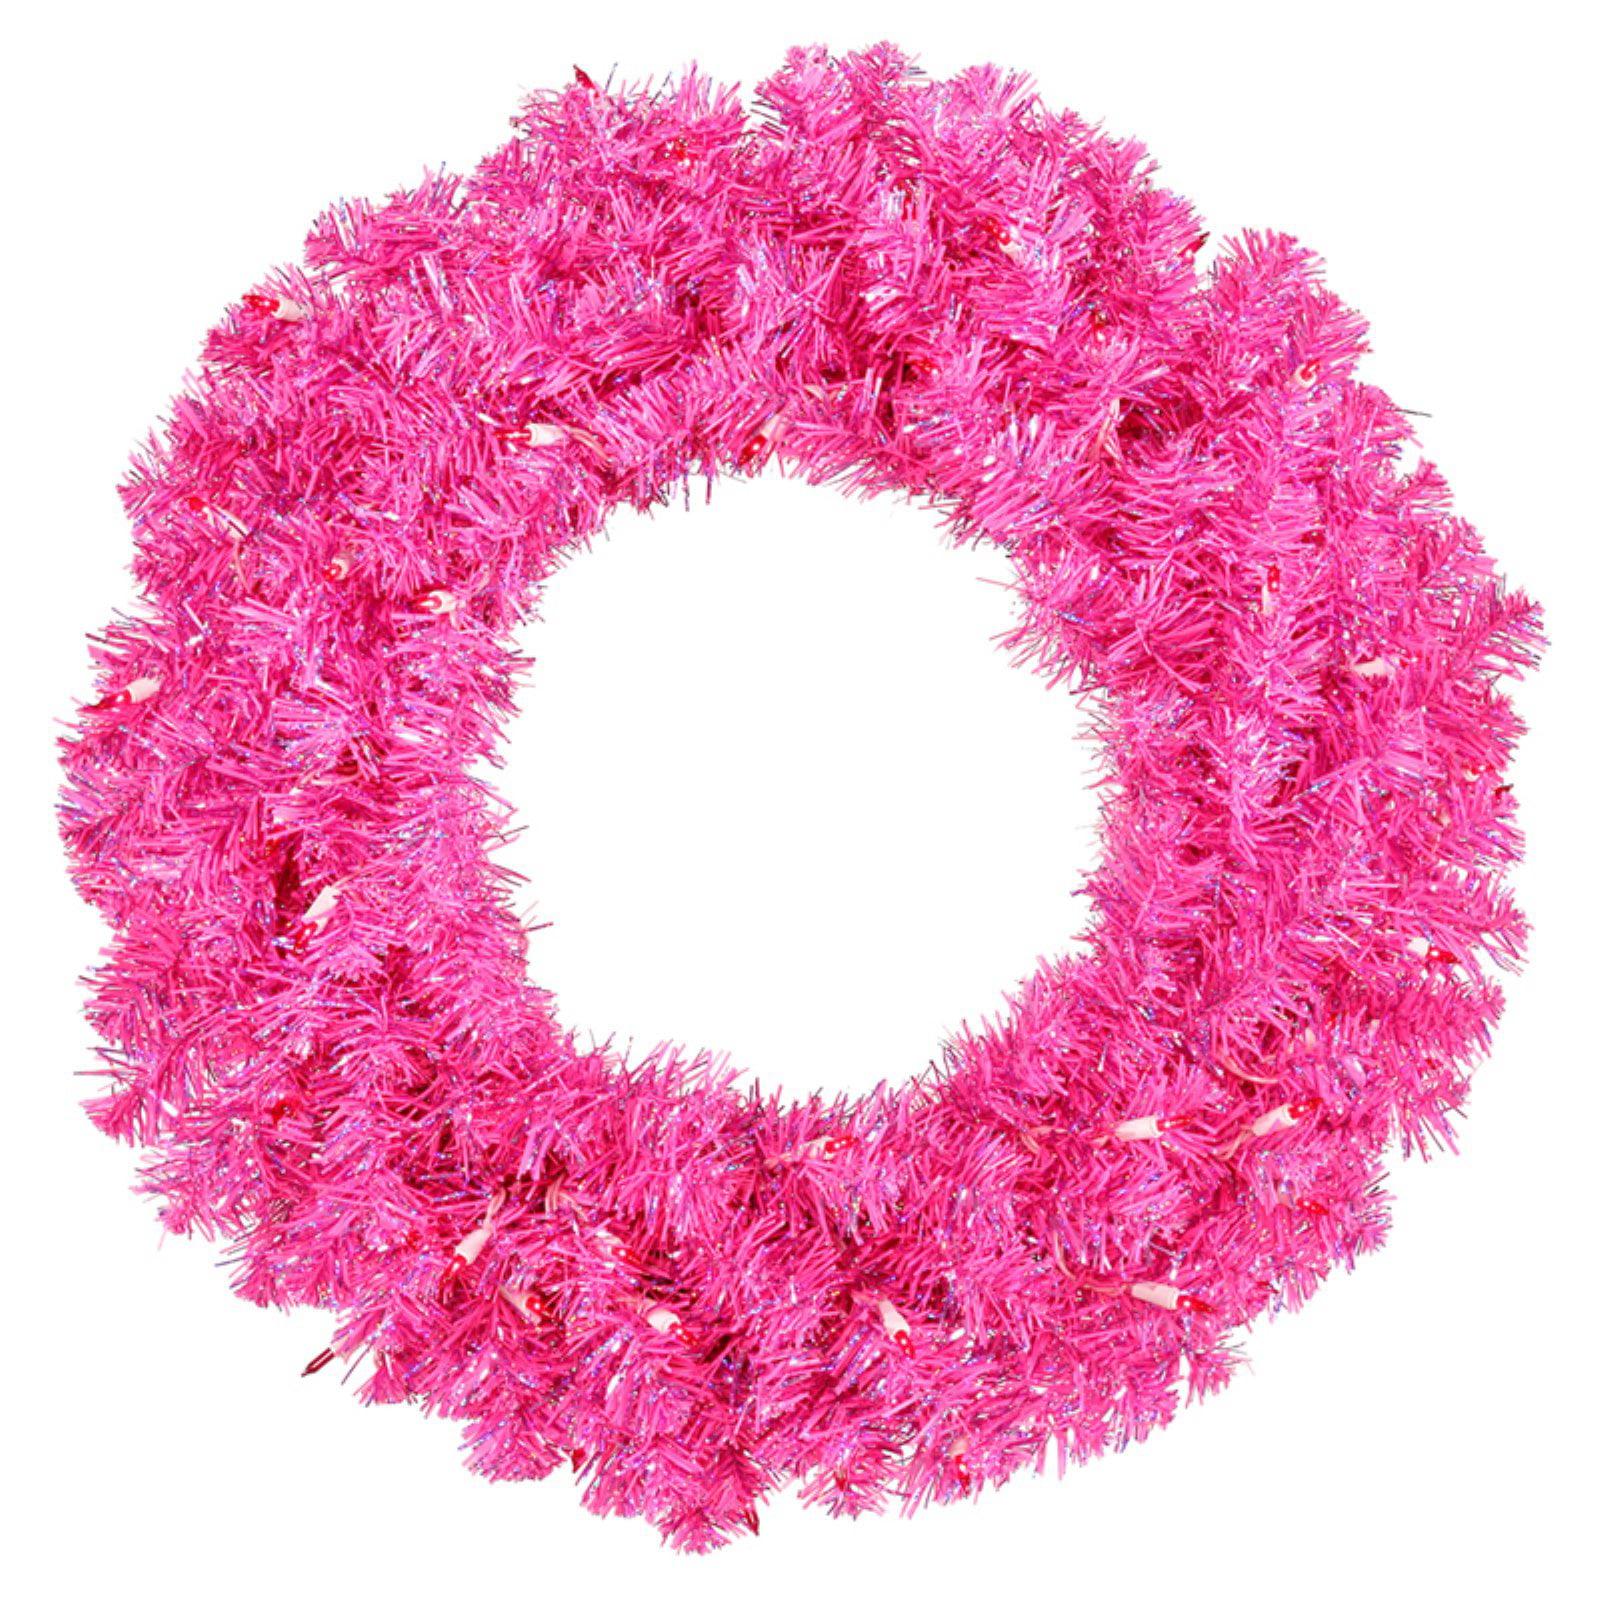 "Vickerman 30"" Hot Pink Wreath 70 Pink Lights 260T"